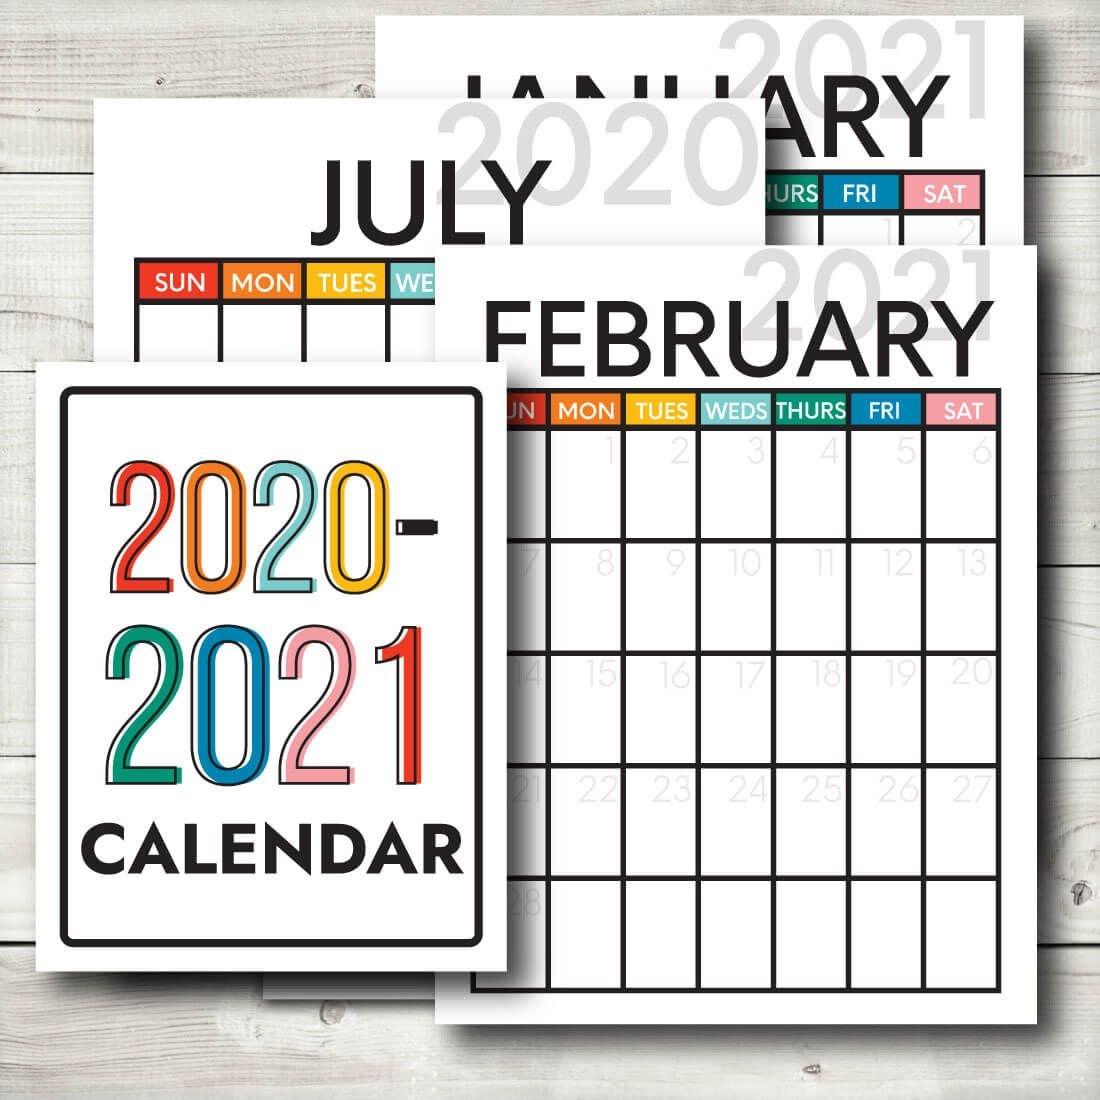 2020-2021 Printable Calendar From Thirty. Handmade Days